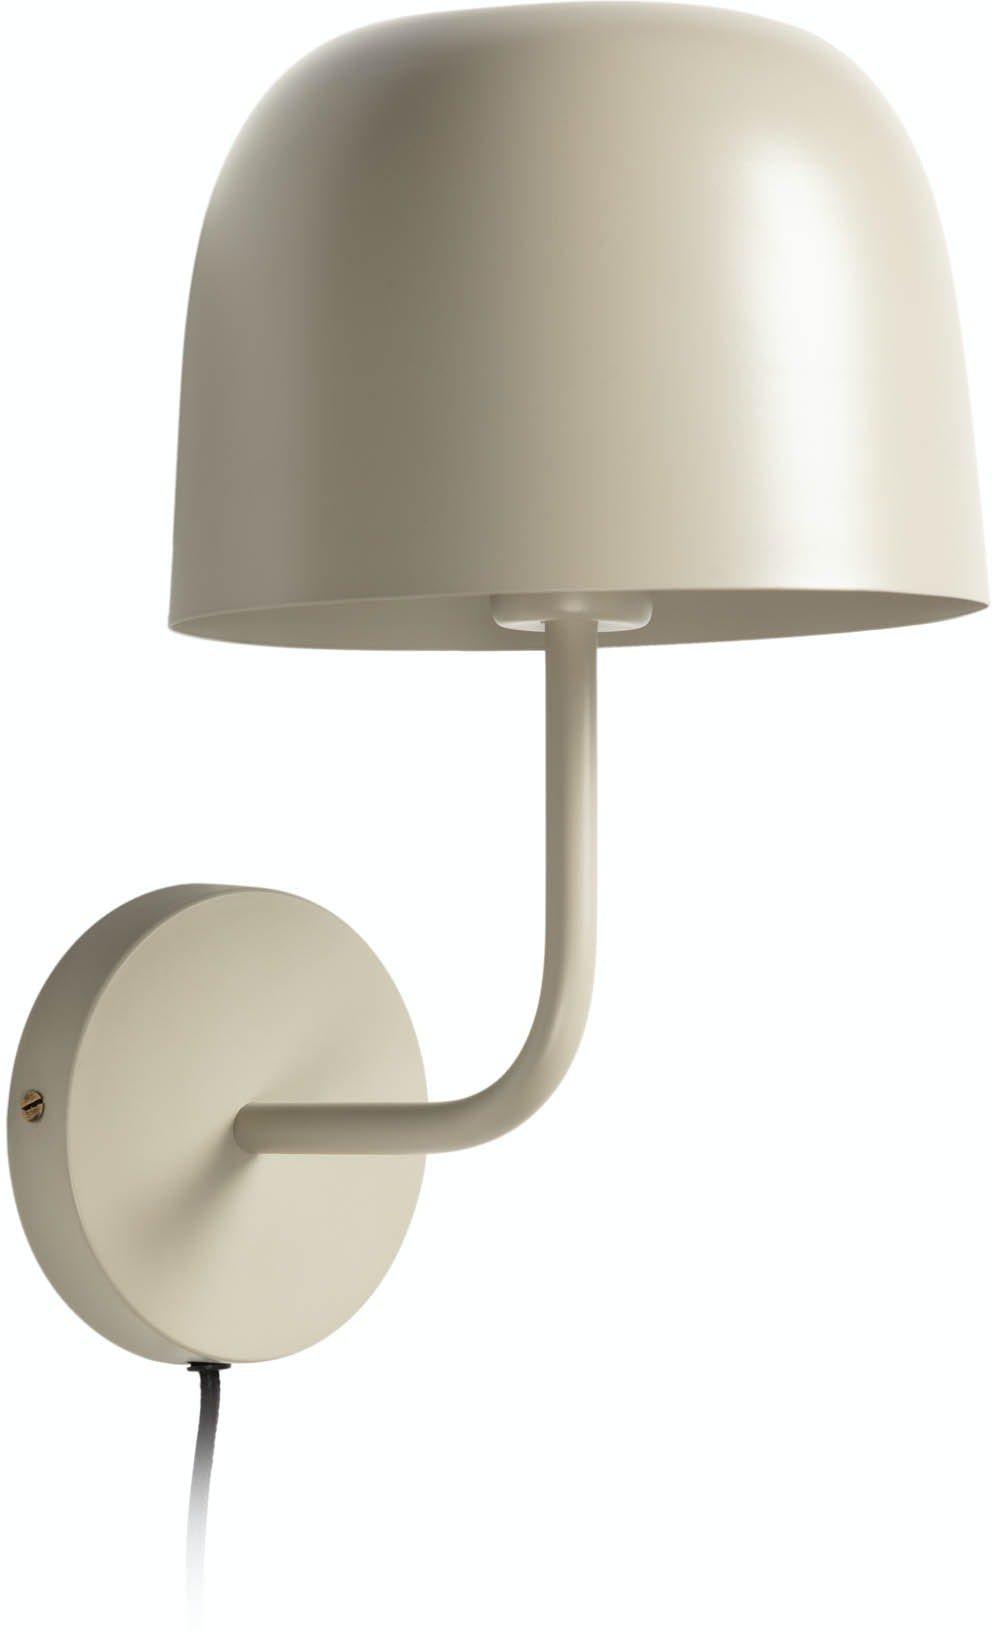 Køb Alish, Væglampe by LaForma (H: 35 cm. B: 23 cm. L: 18 cm., Beige)